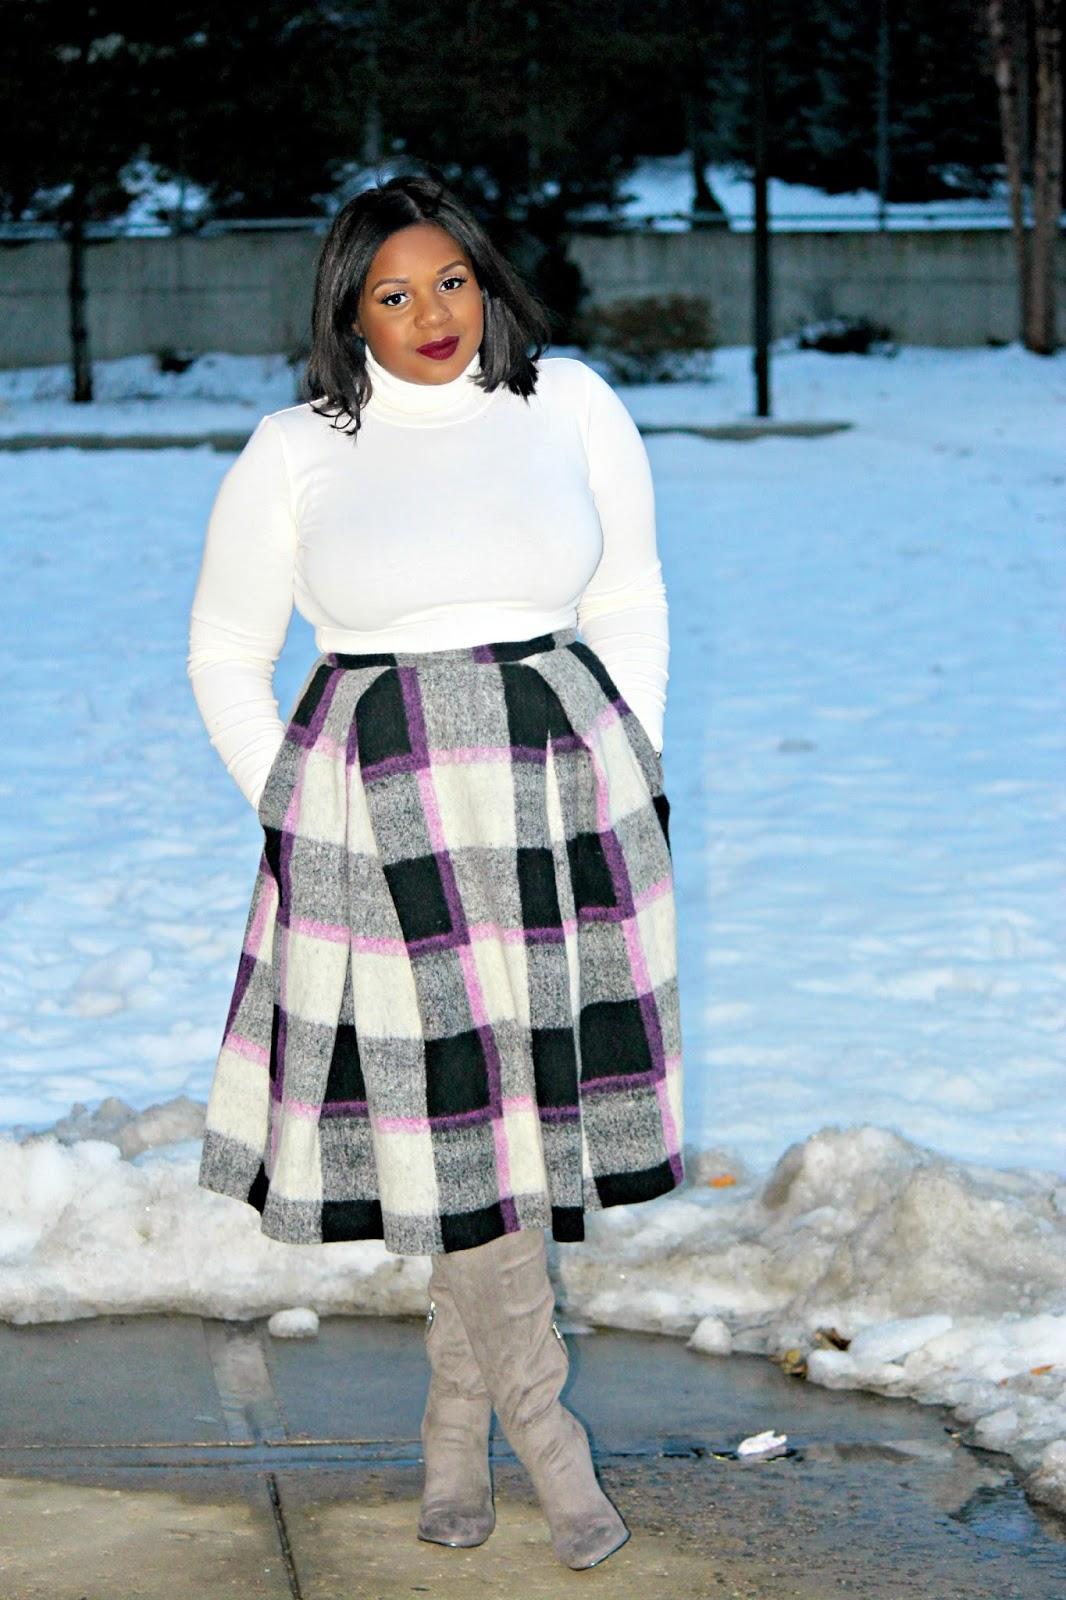 asos full midi skirt plus size, plus size blogger